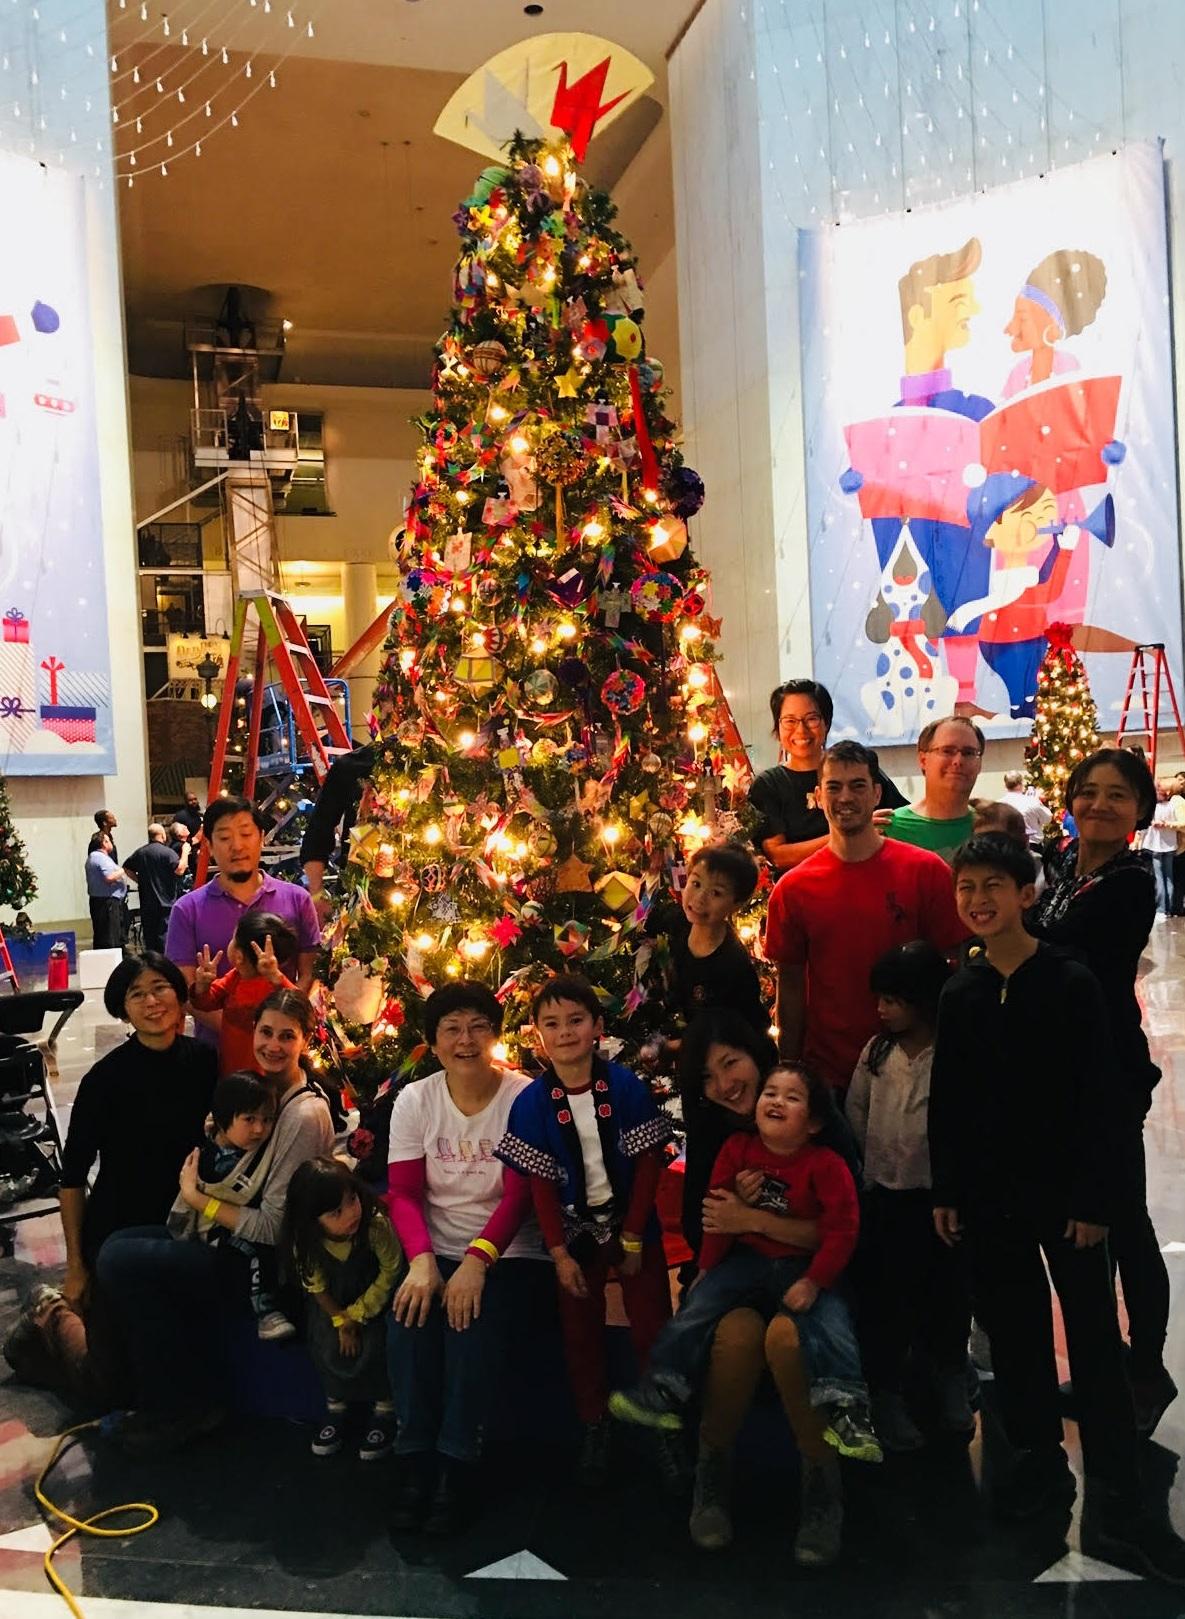 Museum Of Science And Industry Christmas Around The World 2019 Tampopo Kai | JASC